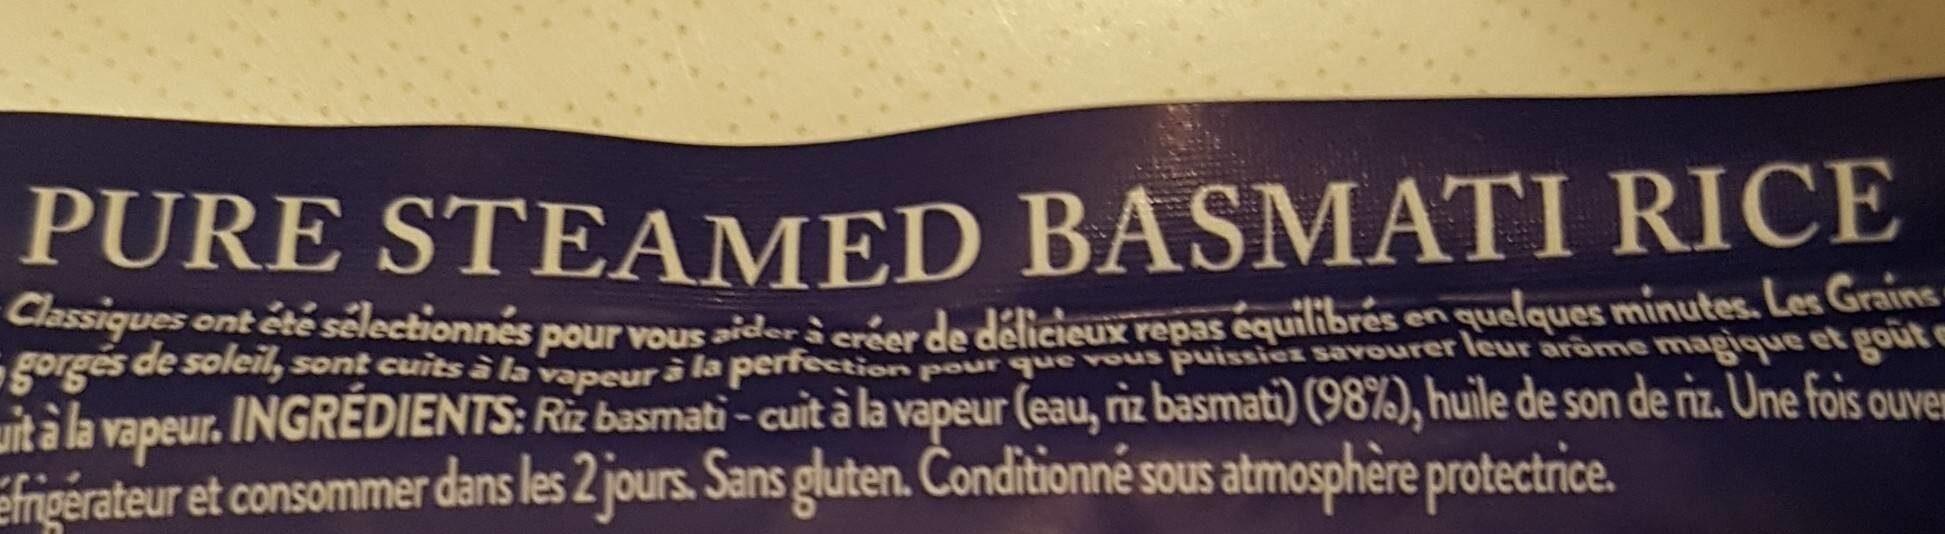 Tilda Pure Basmati - Ingrédients - fr